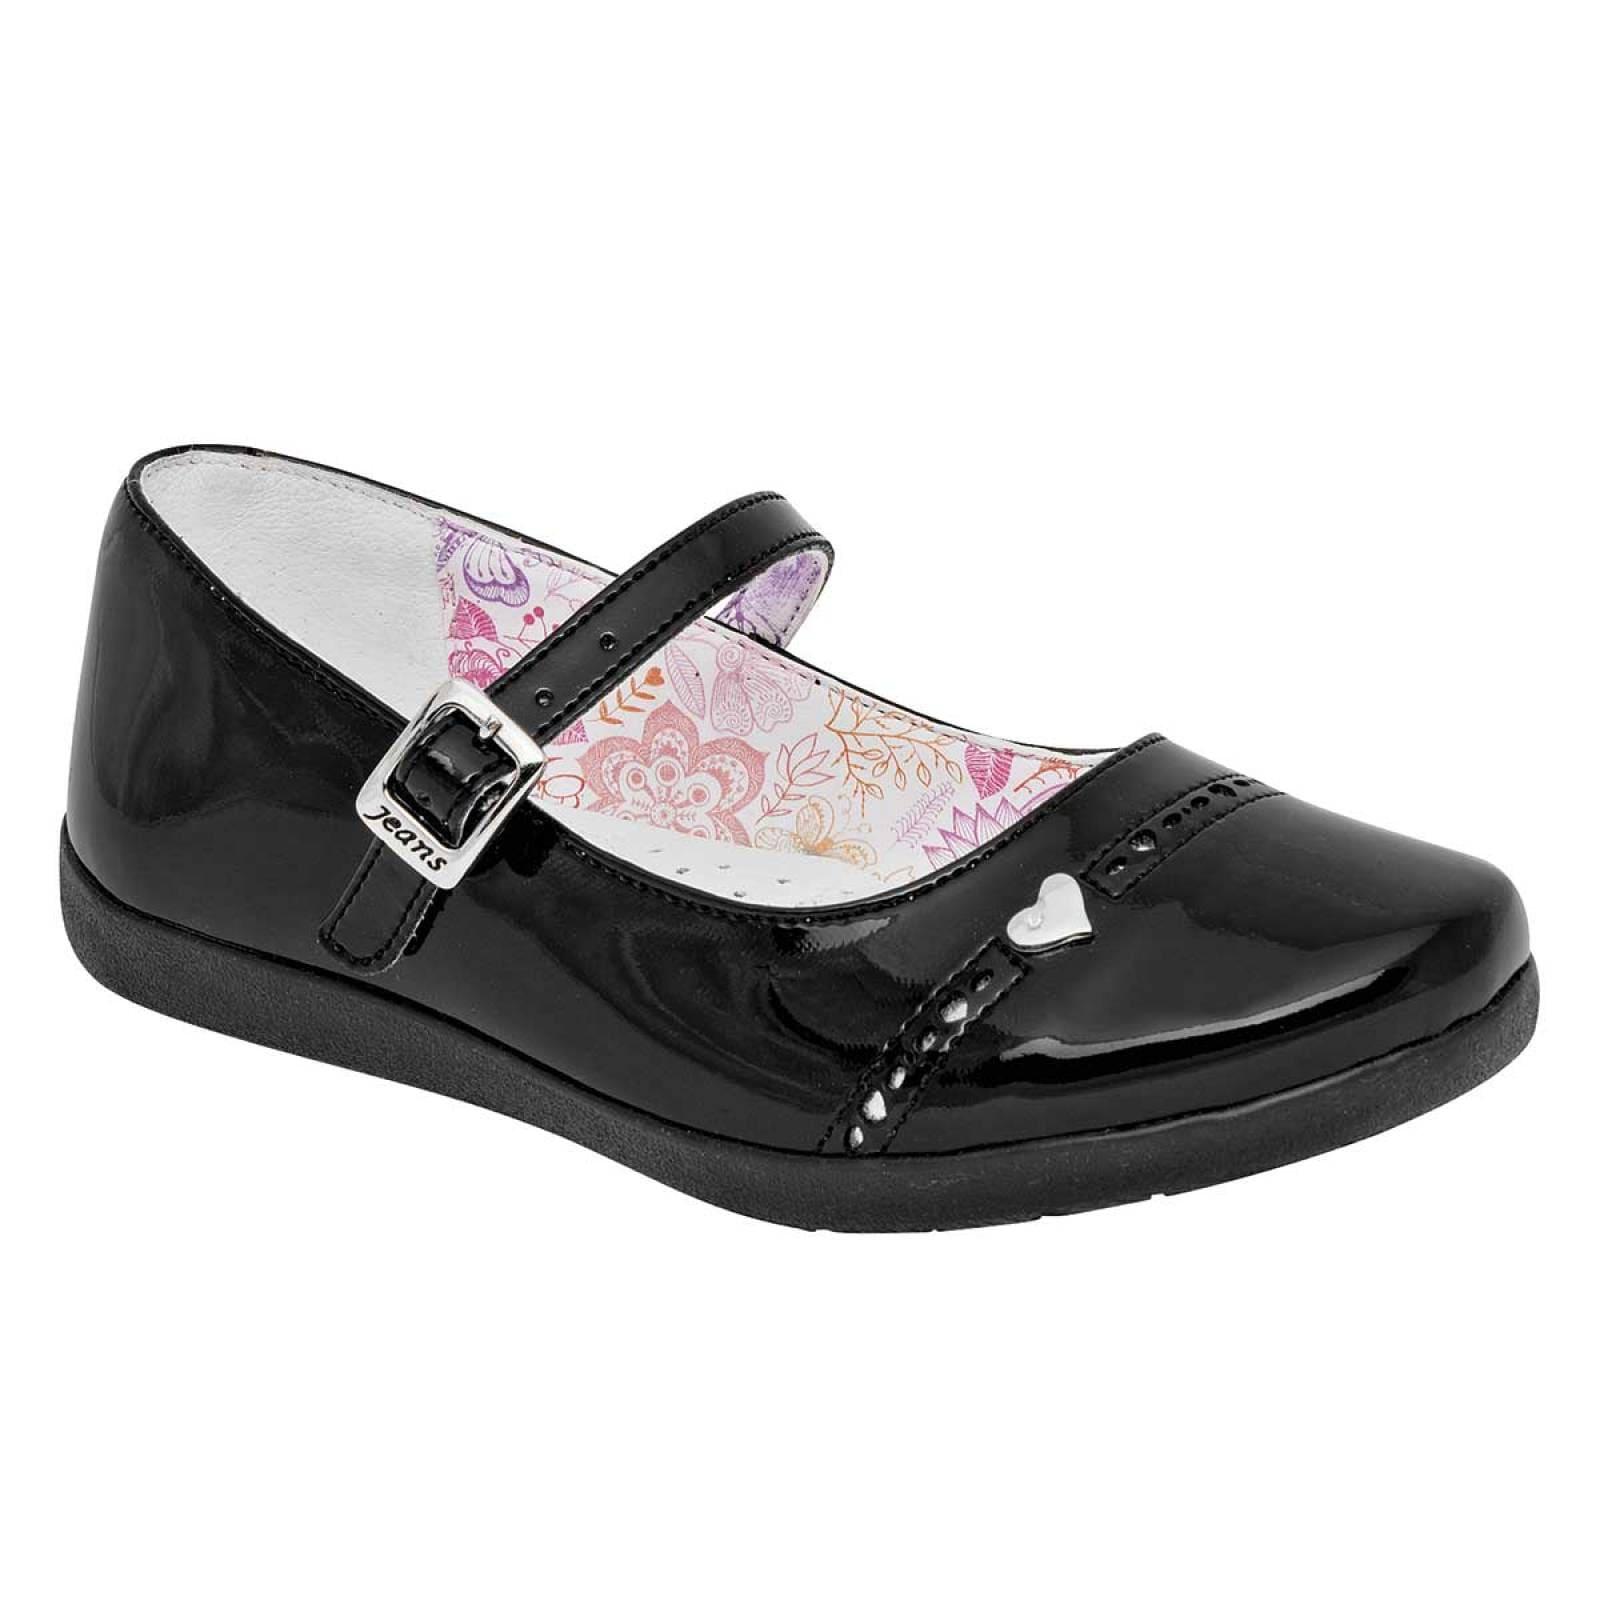 Jeans shoes Zapato Niña Negro charol